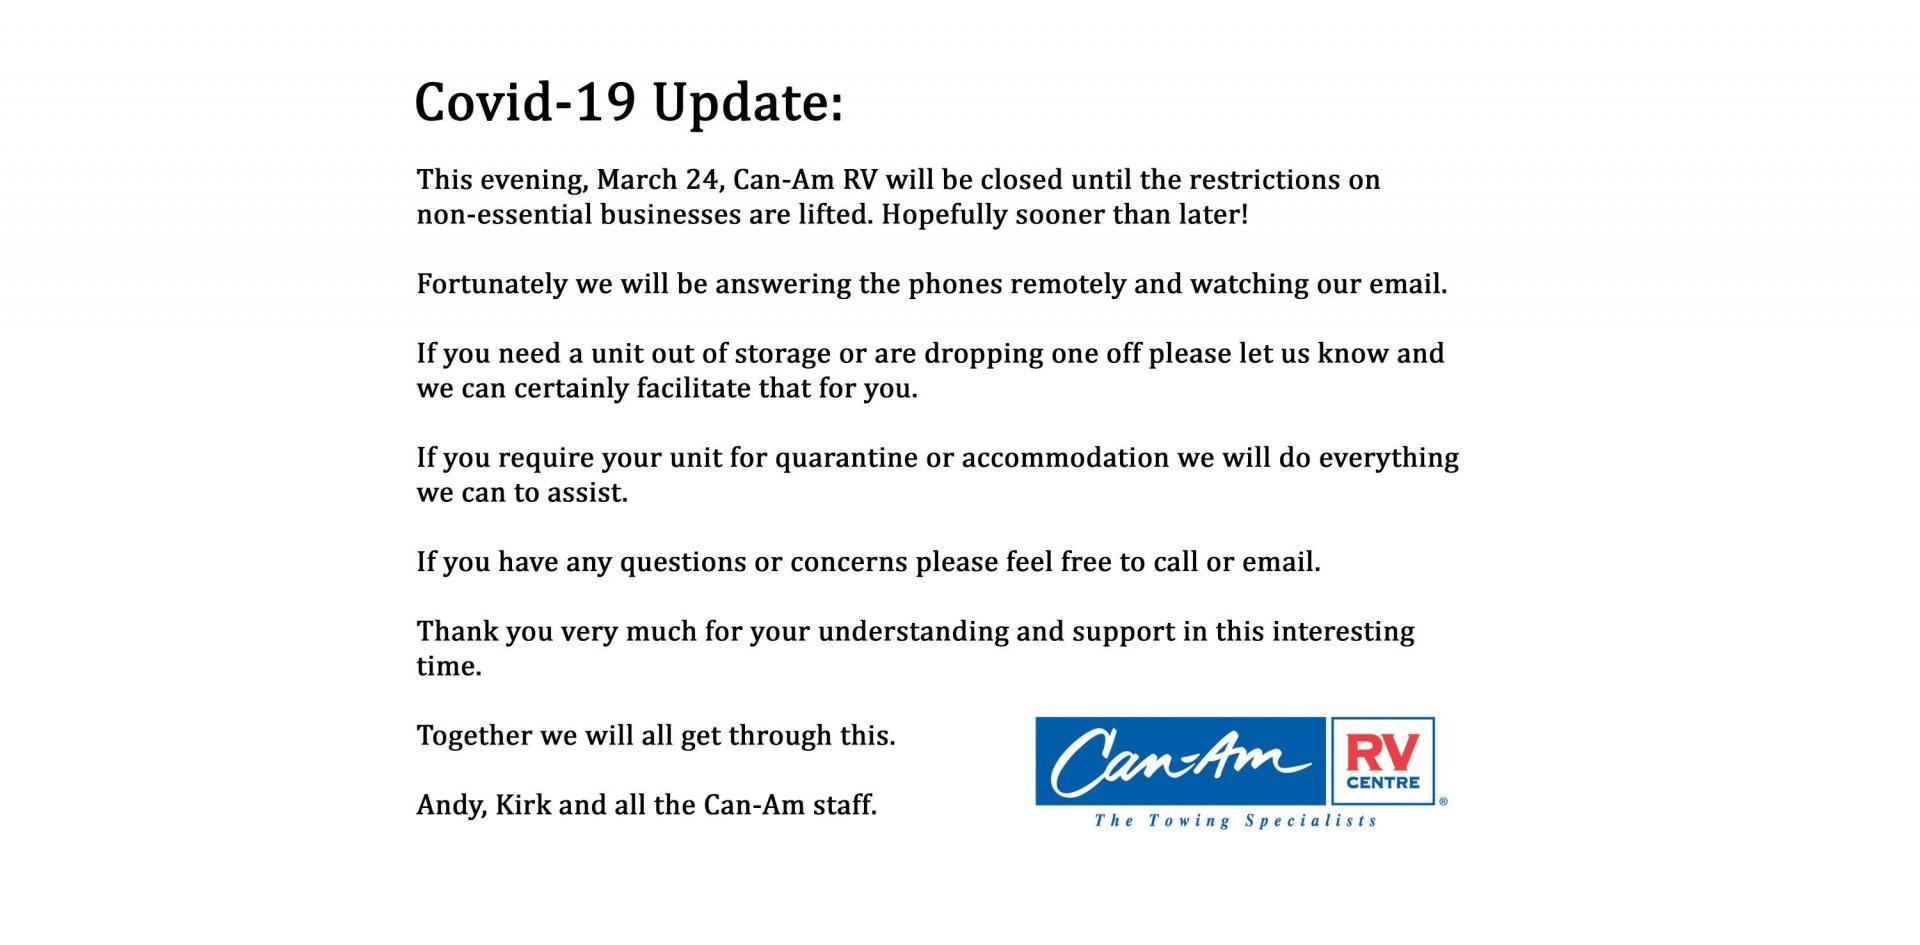 Covid-19 Update Slide Image